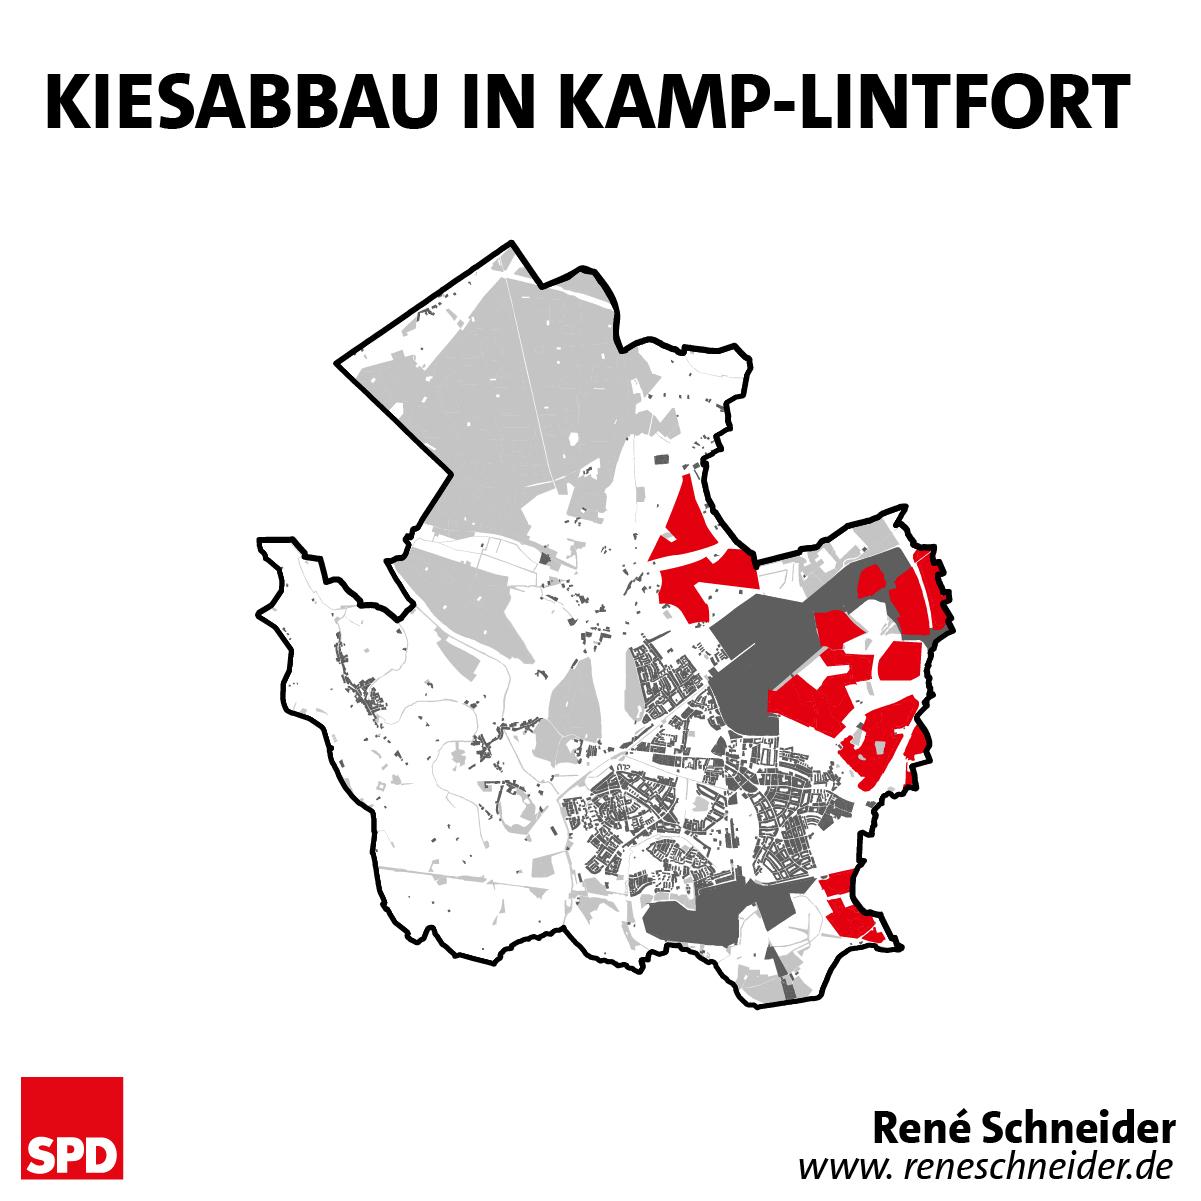 Kiesabbau in Kamp-Lintfort